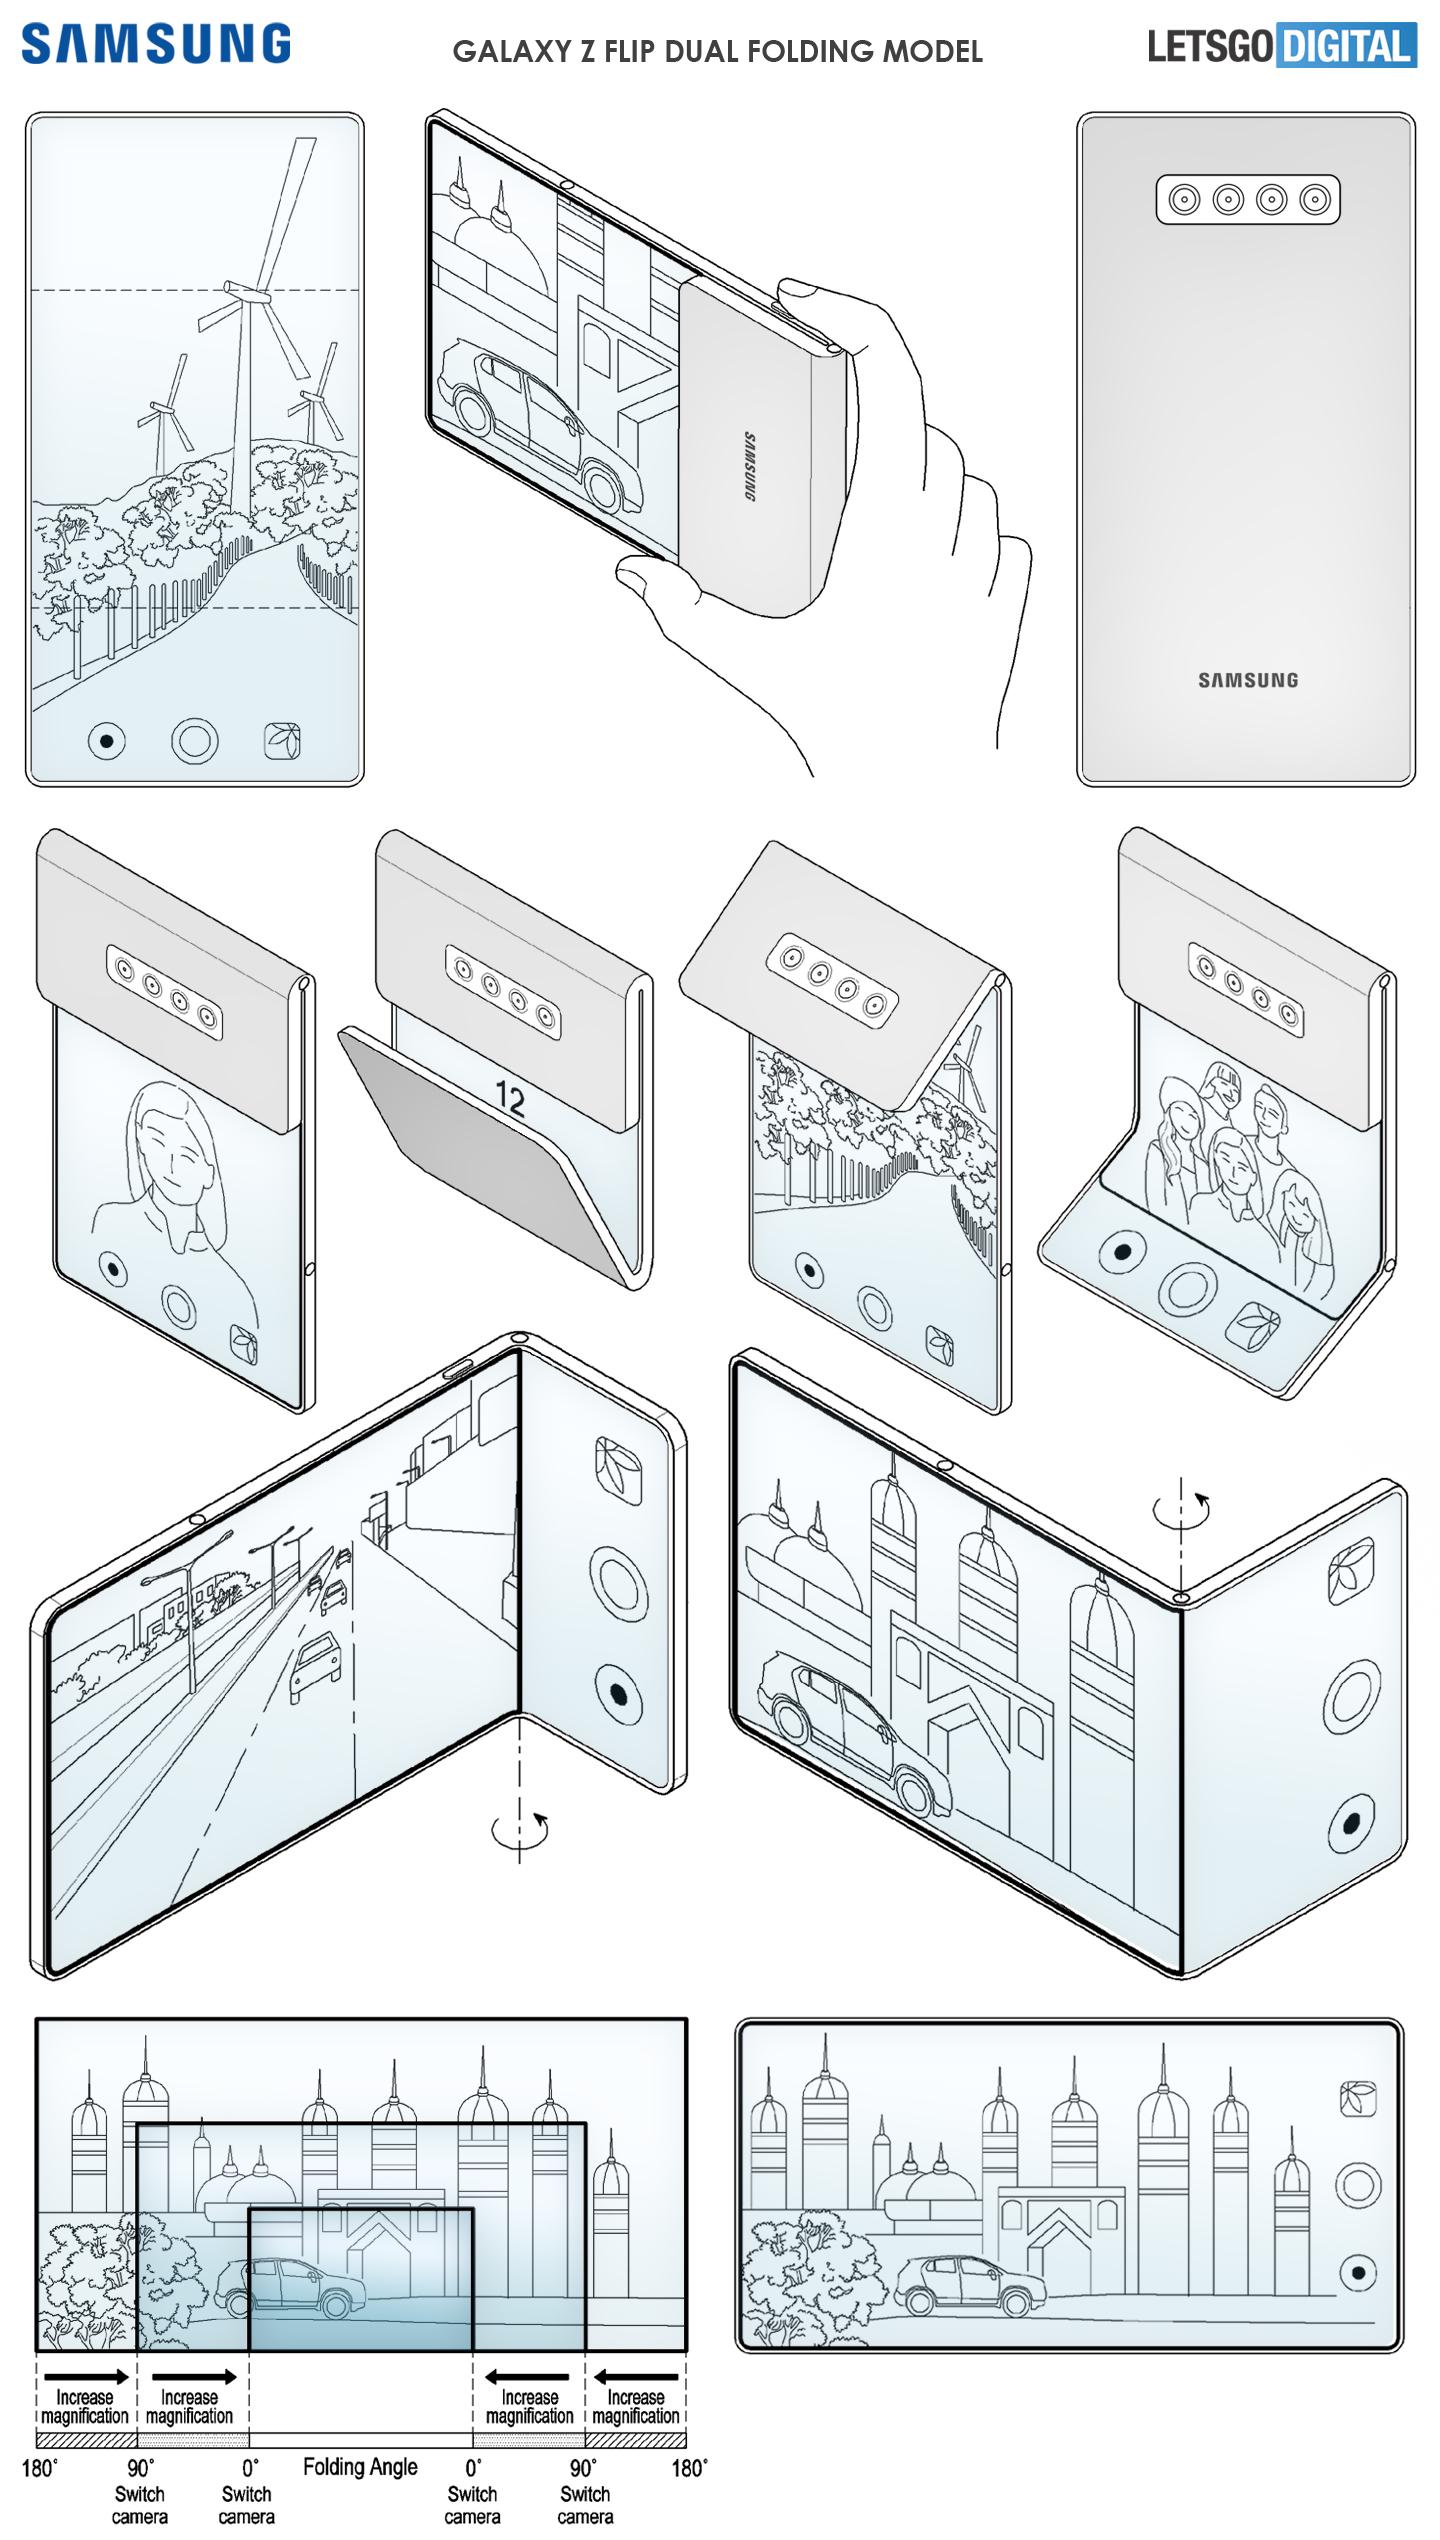 Galaxy Z Flip 2 smartphone